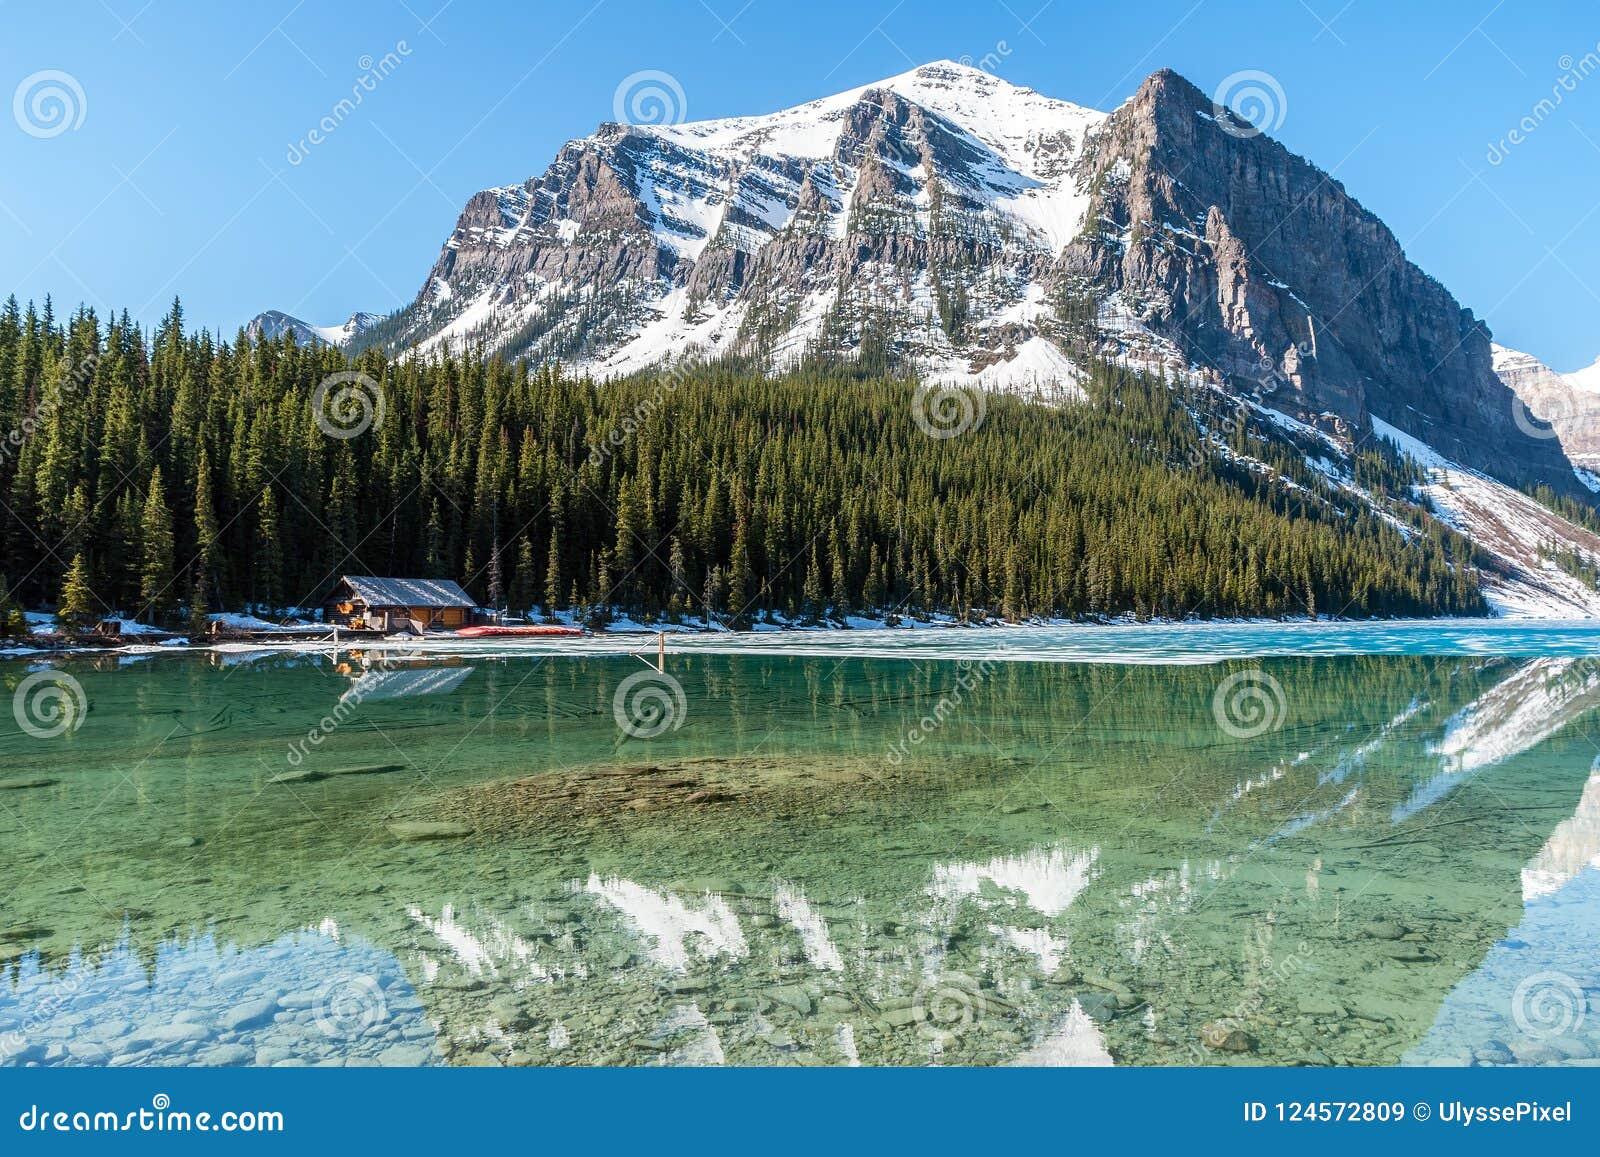 Boathouse next to Lake Louise - Banff , Alberta, Cana